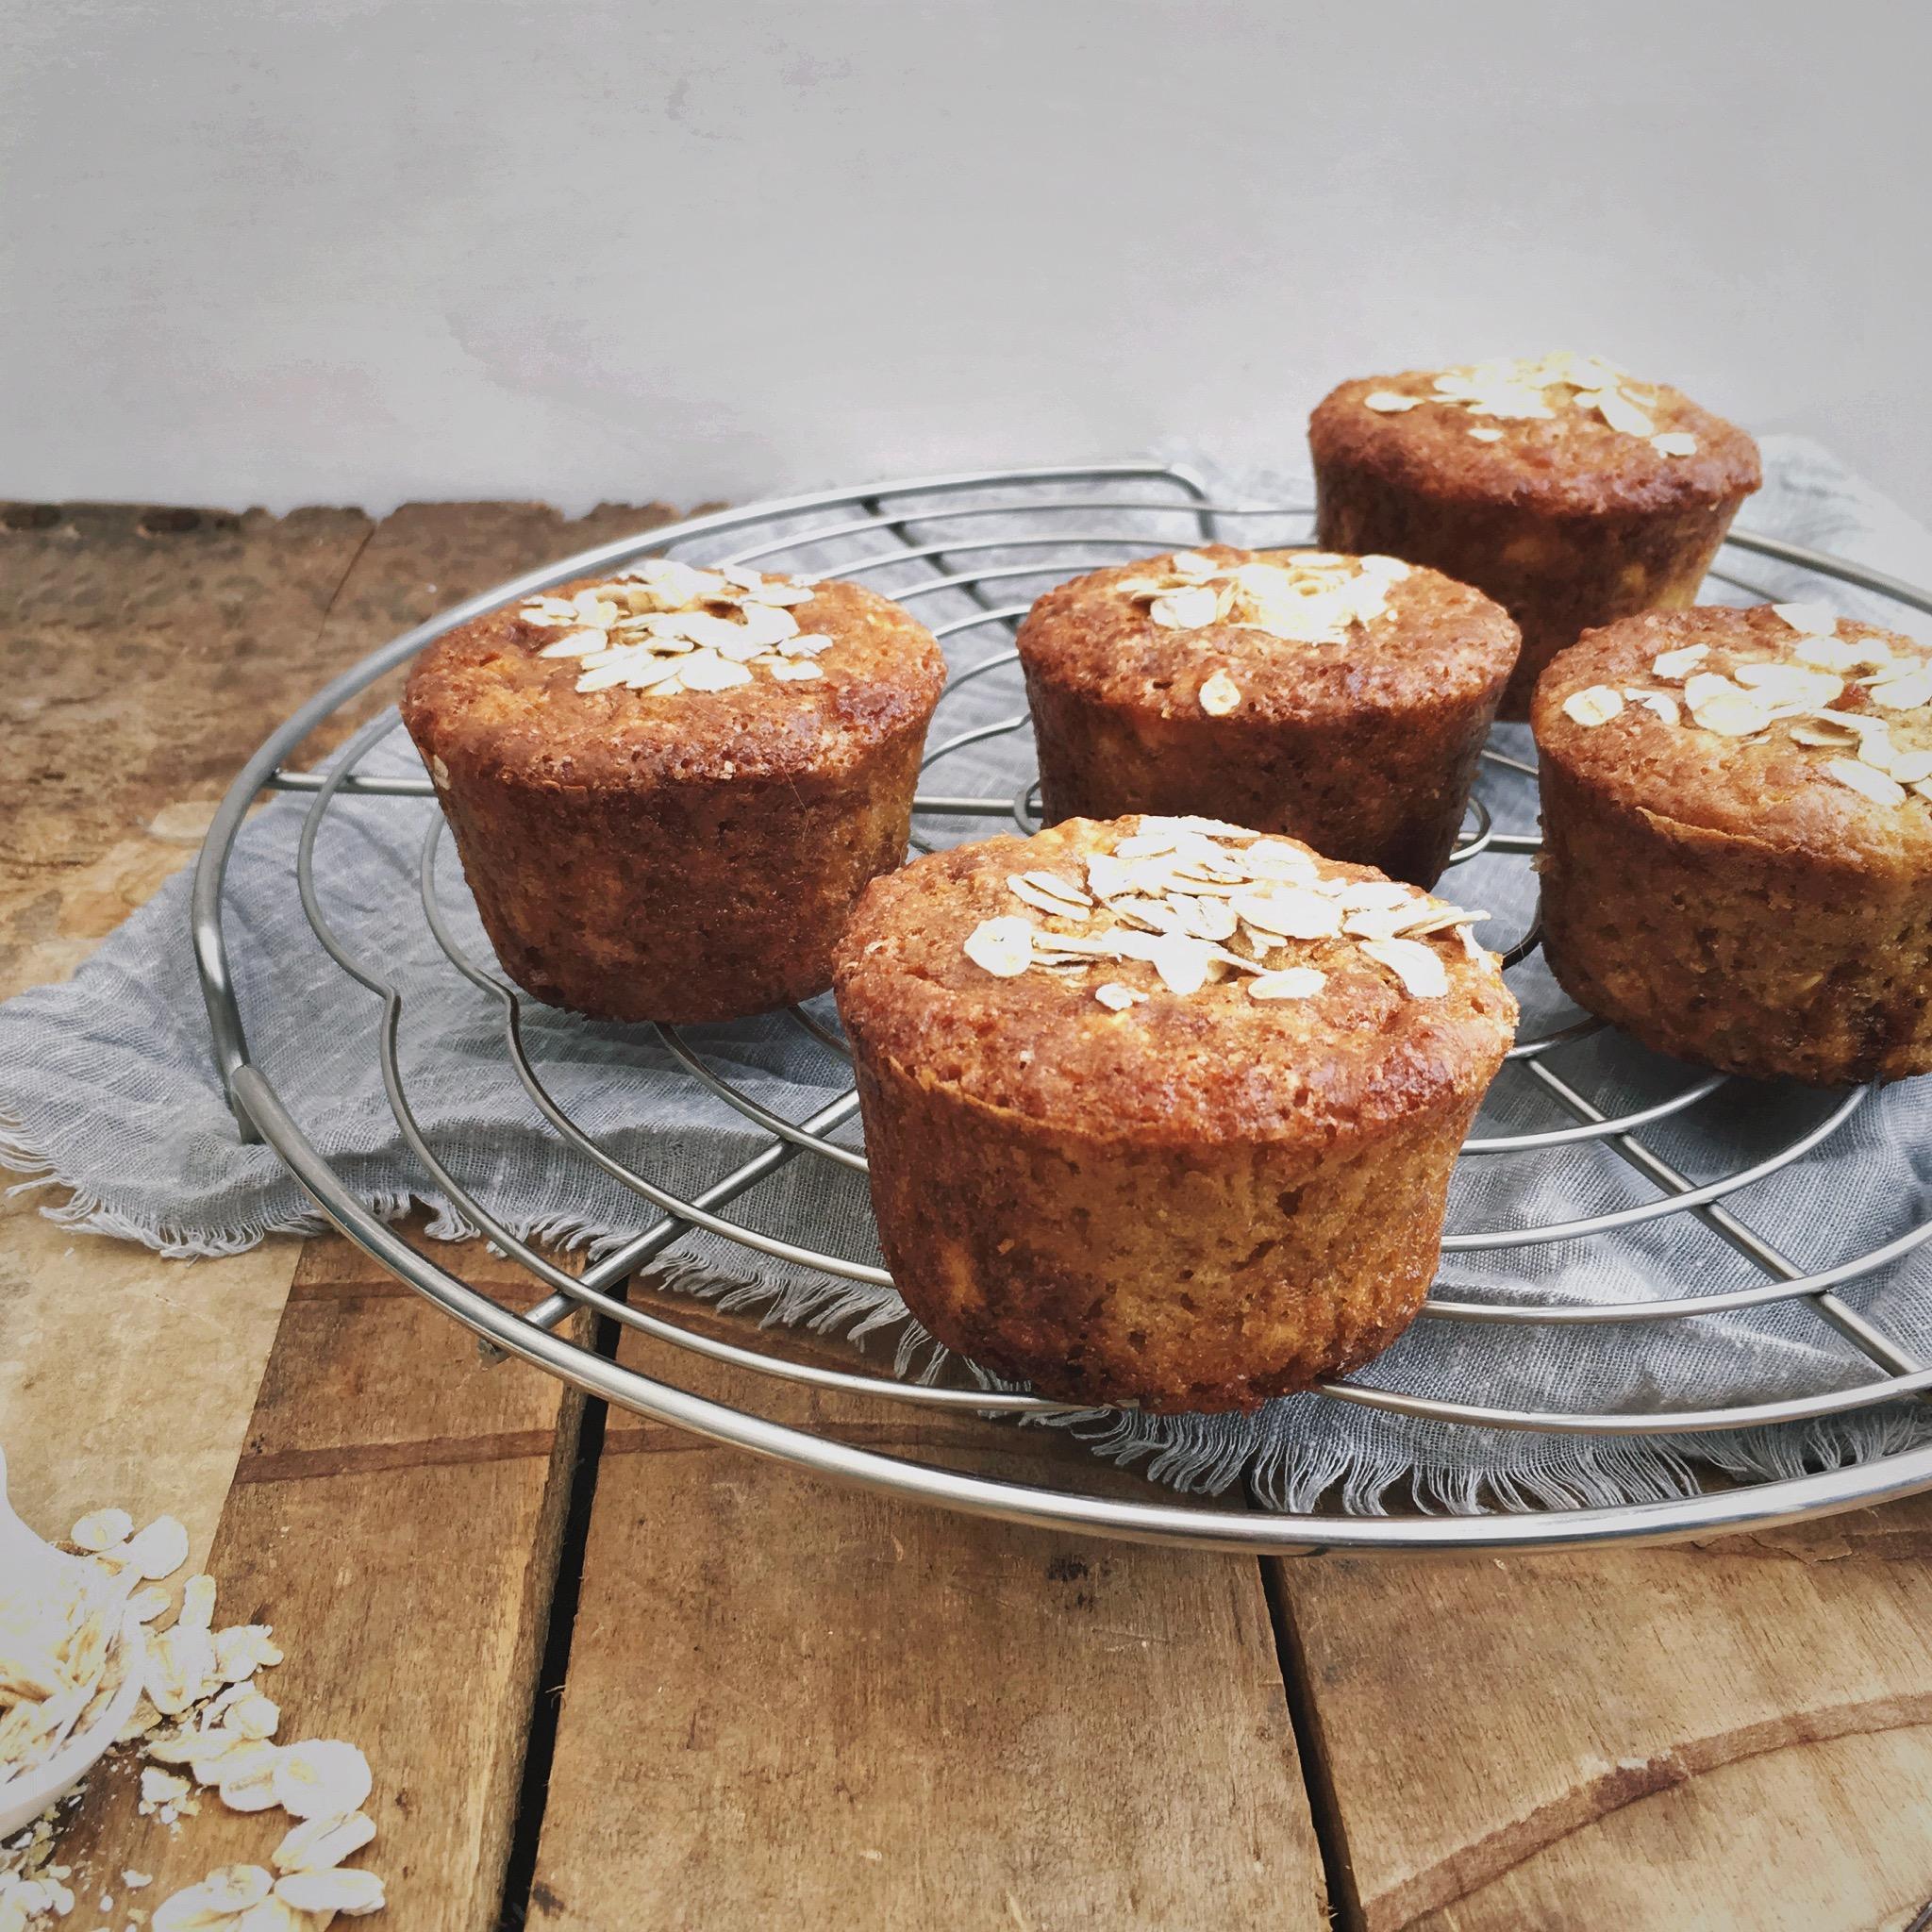 Sinaasappel muffins met havermout